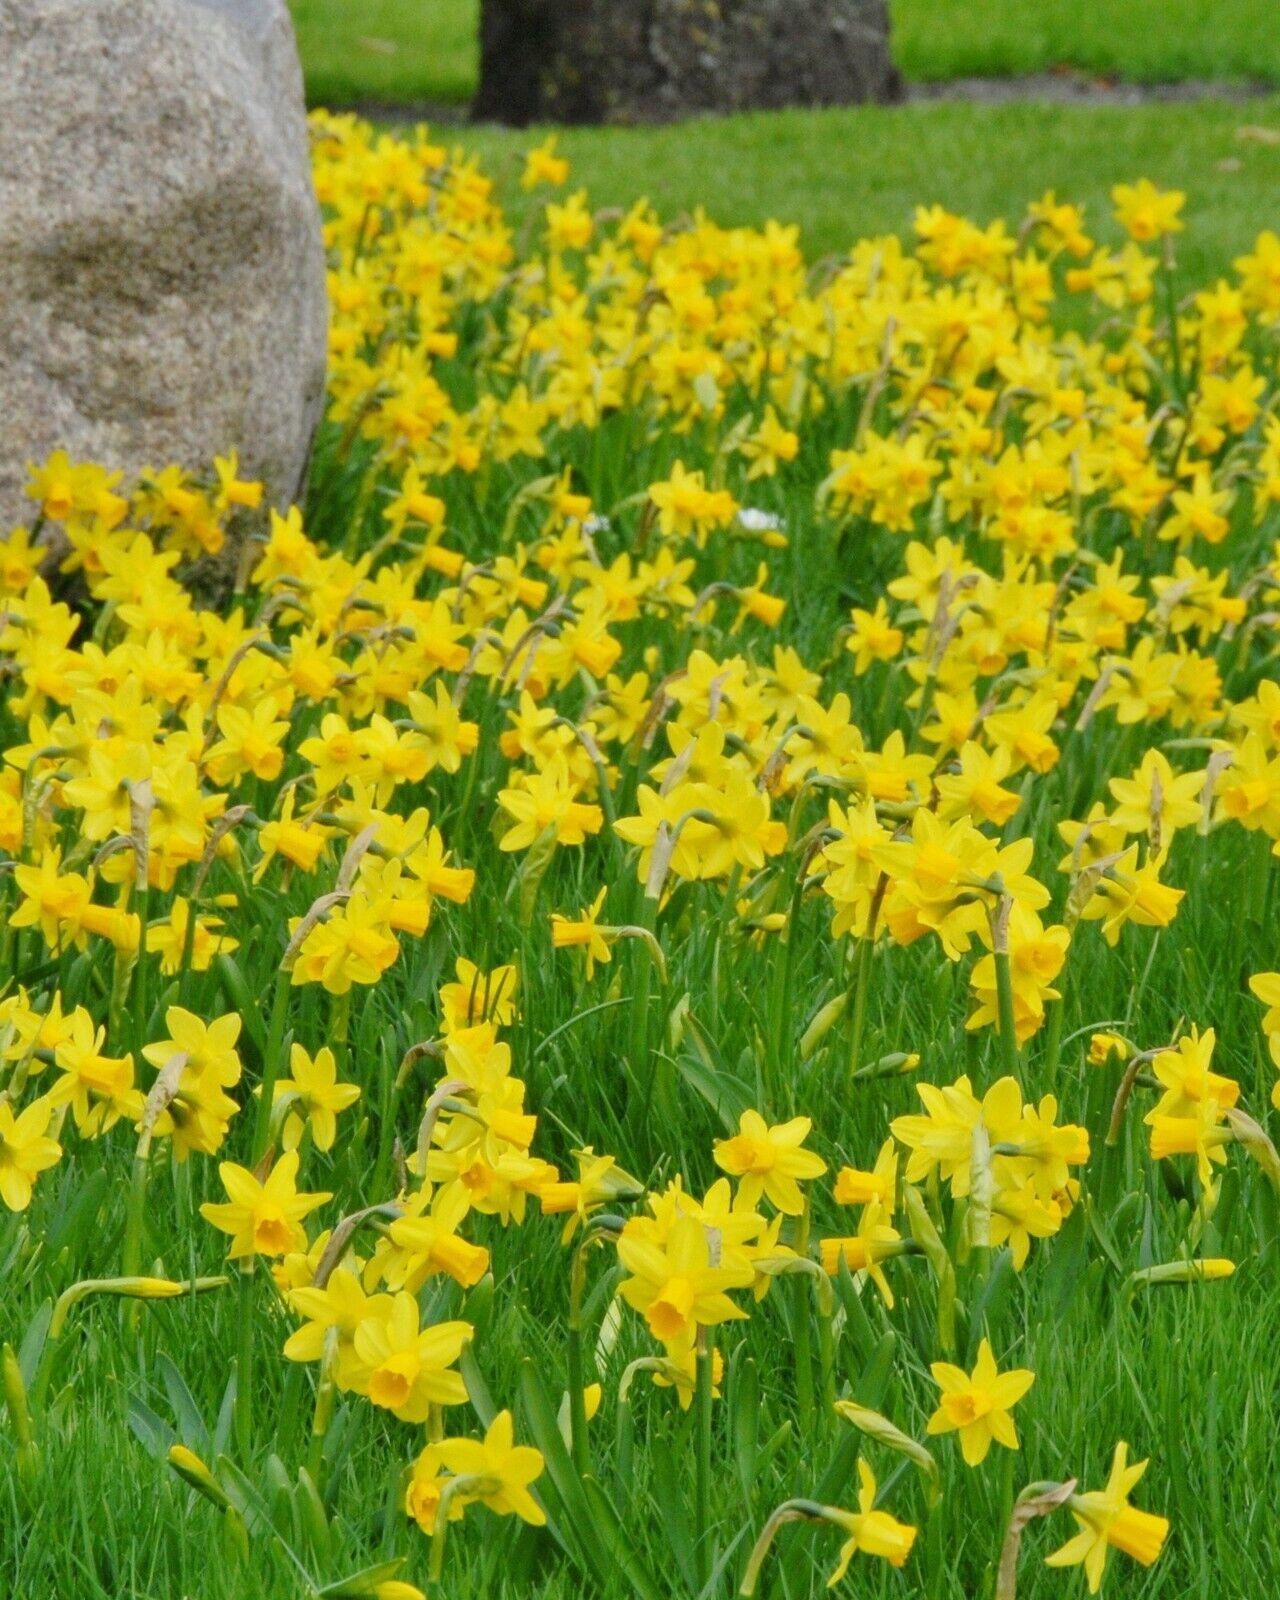 Narcissus Daffodils Tete A Tete Bulbs Fresh Spring Flowering Dwarf Miniatures